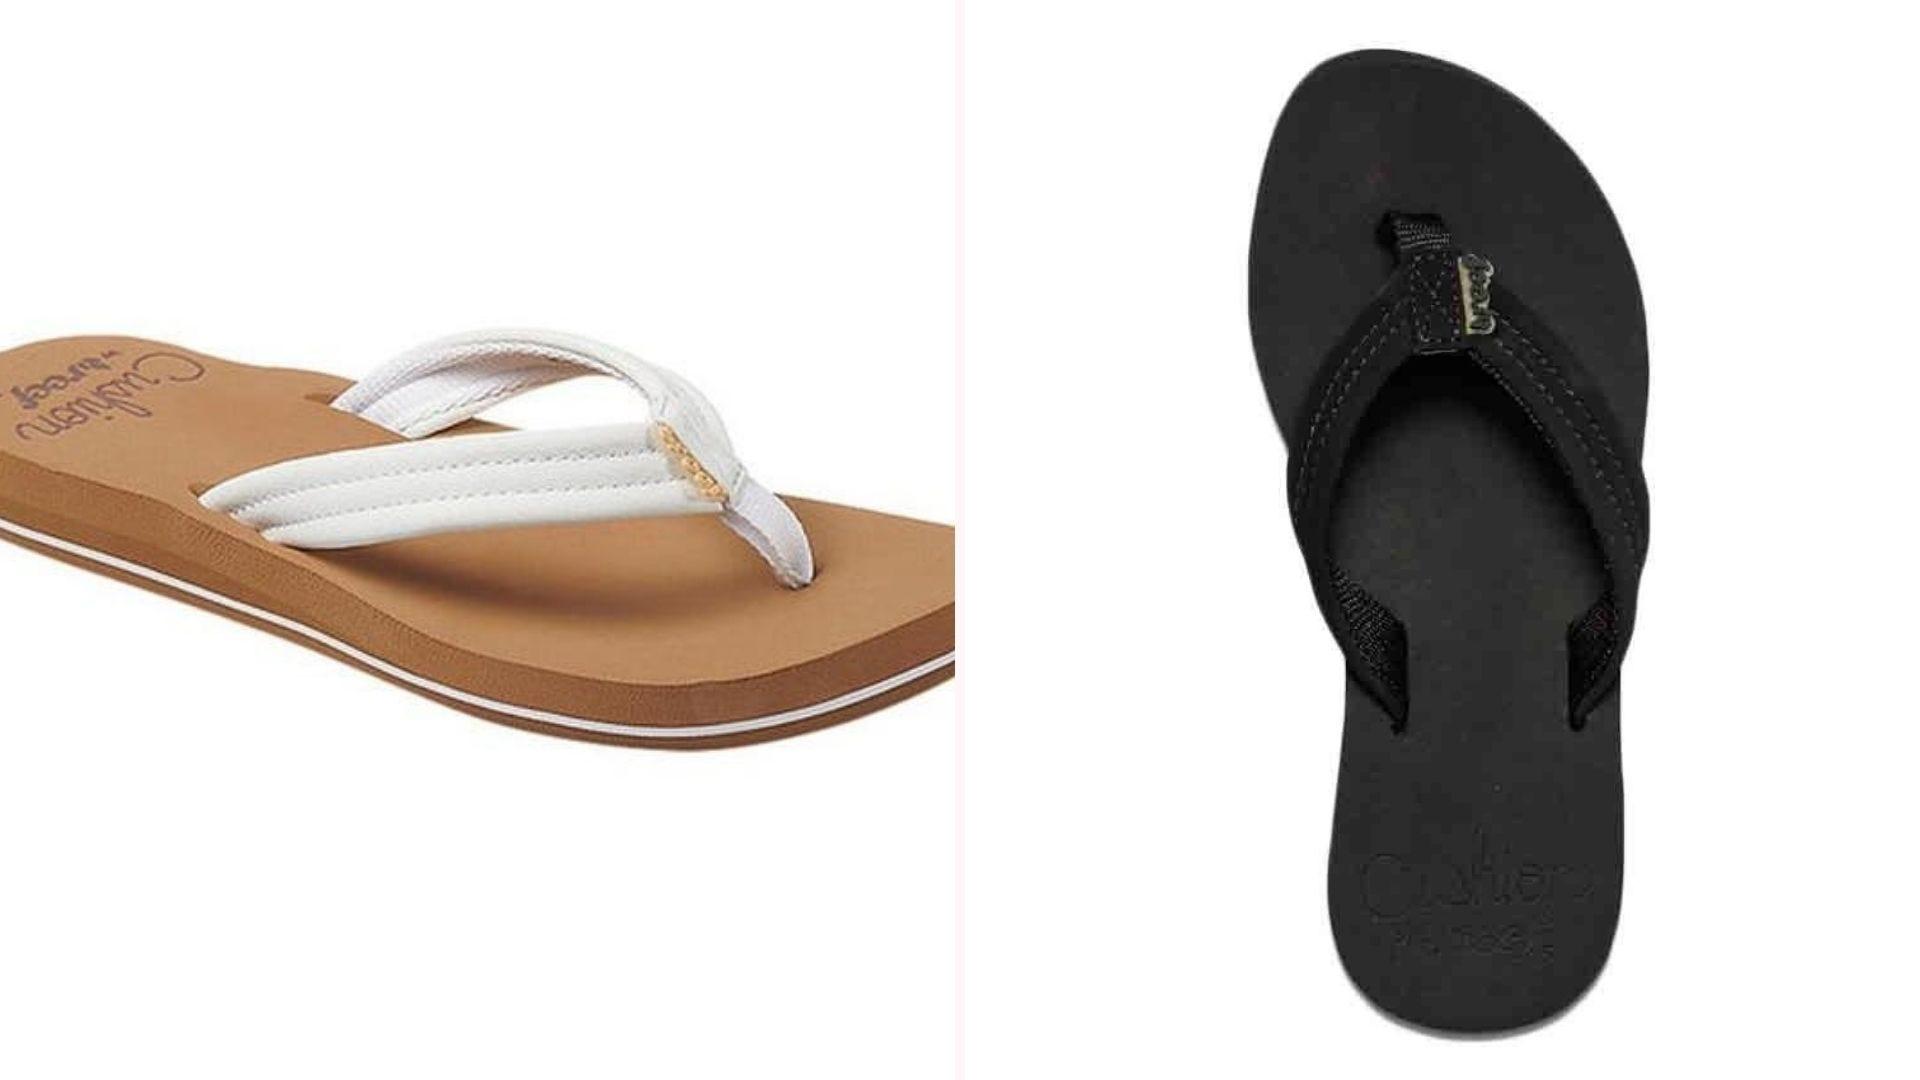 One tan-and-white sandal, one black sandal